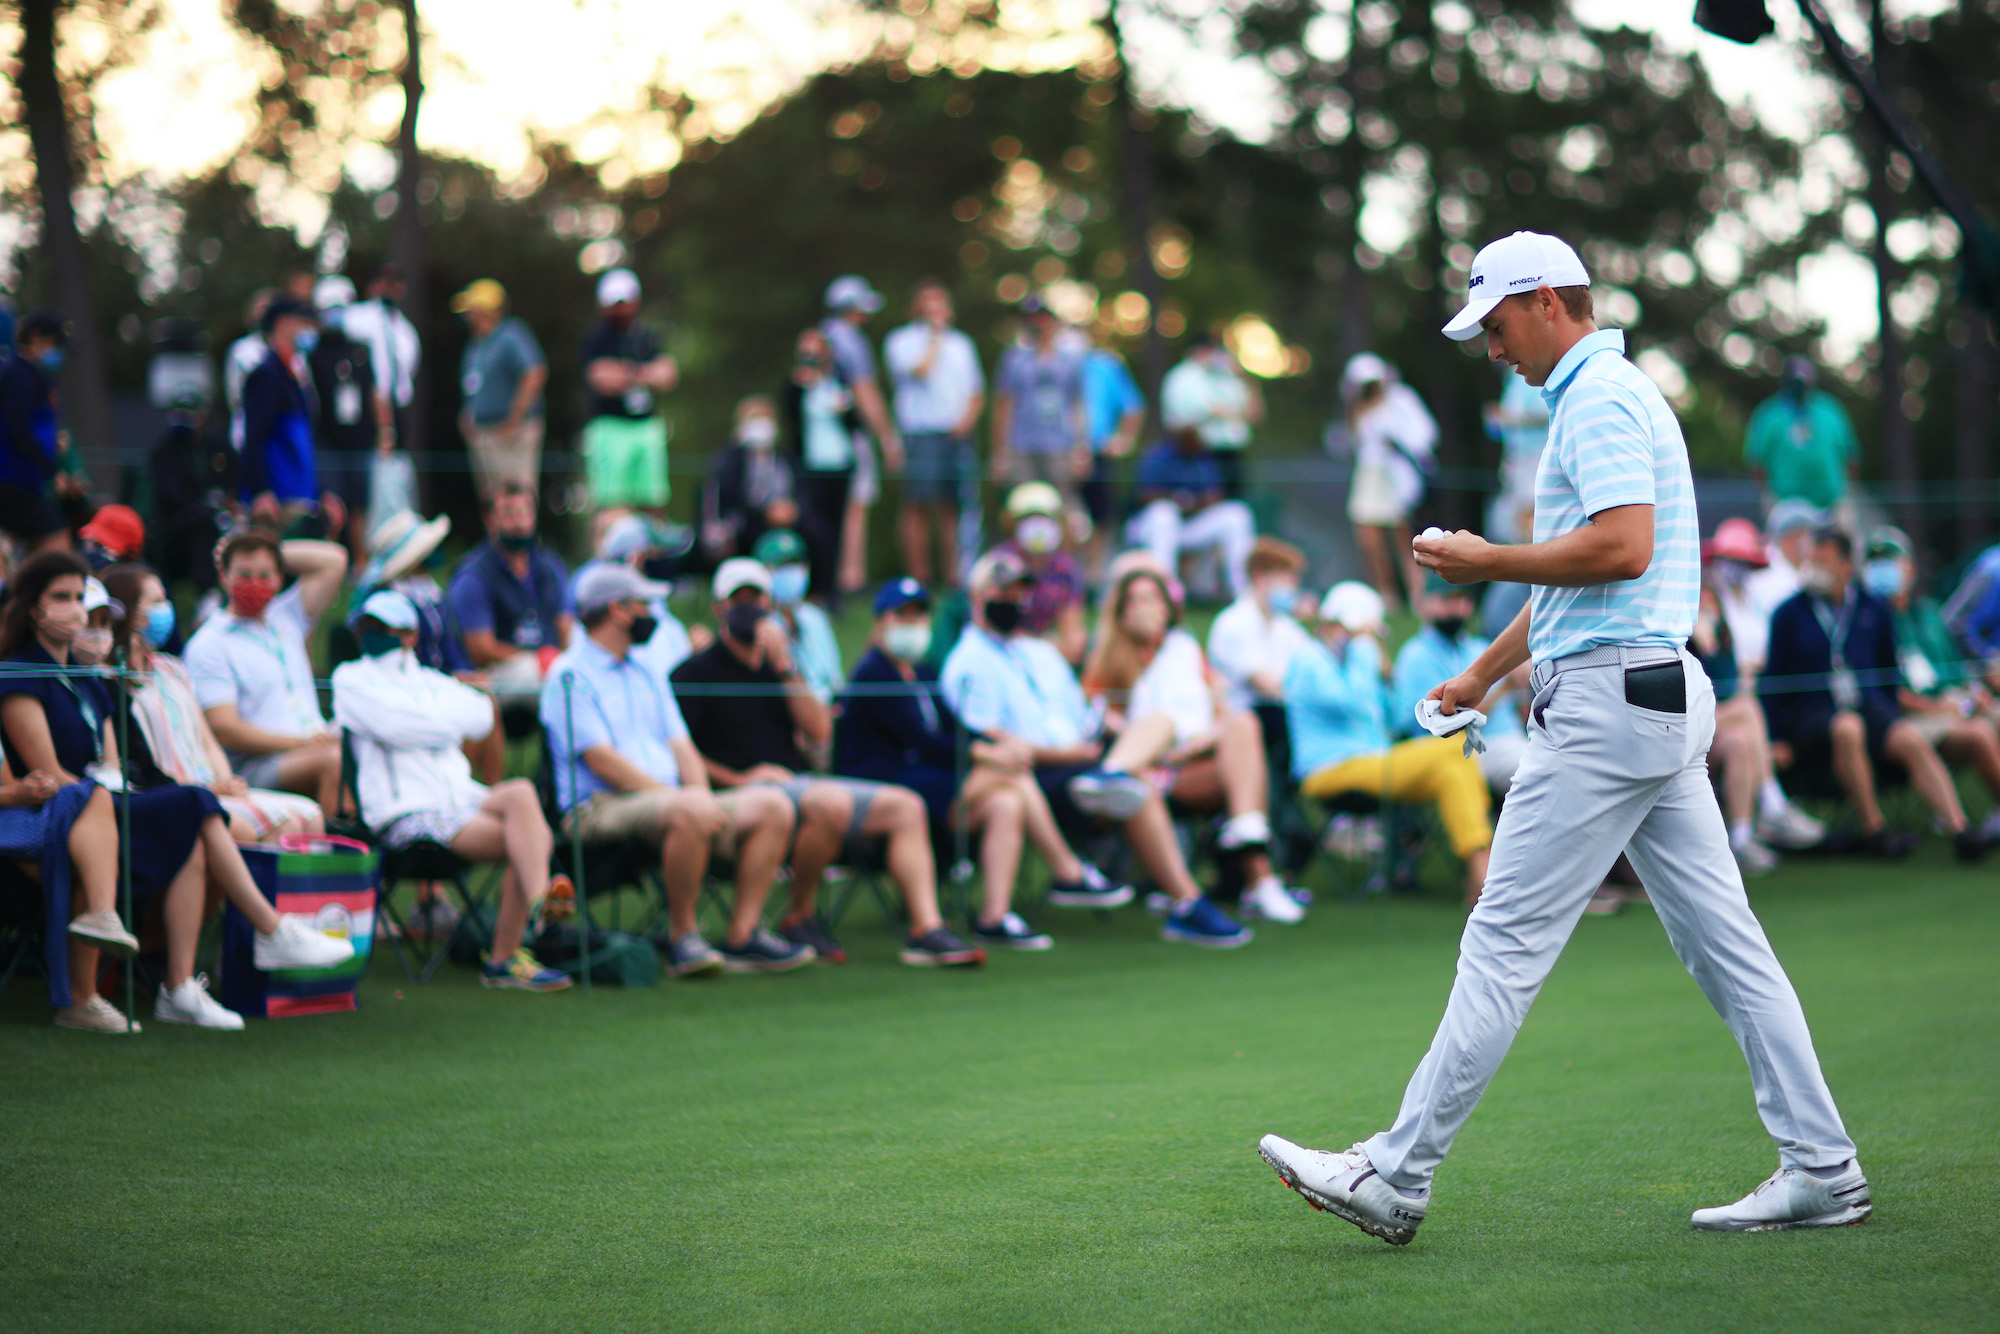 2021 Masters Tournament: Round 3 - Jordan Walks Off the 18th Green